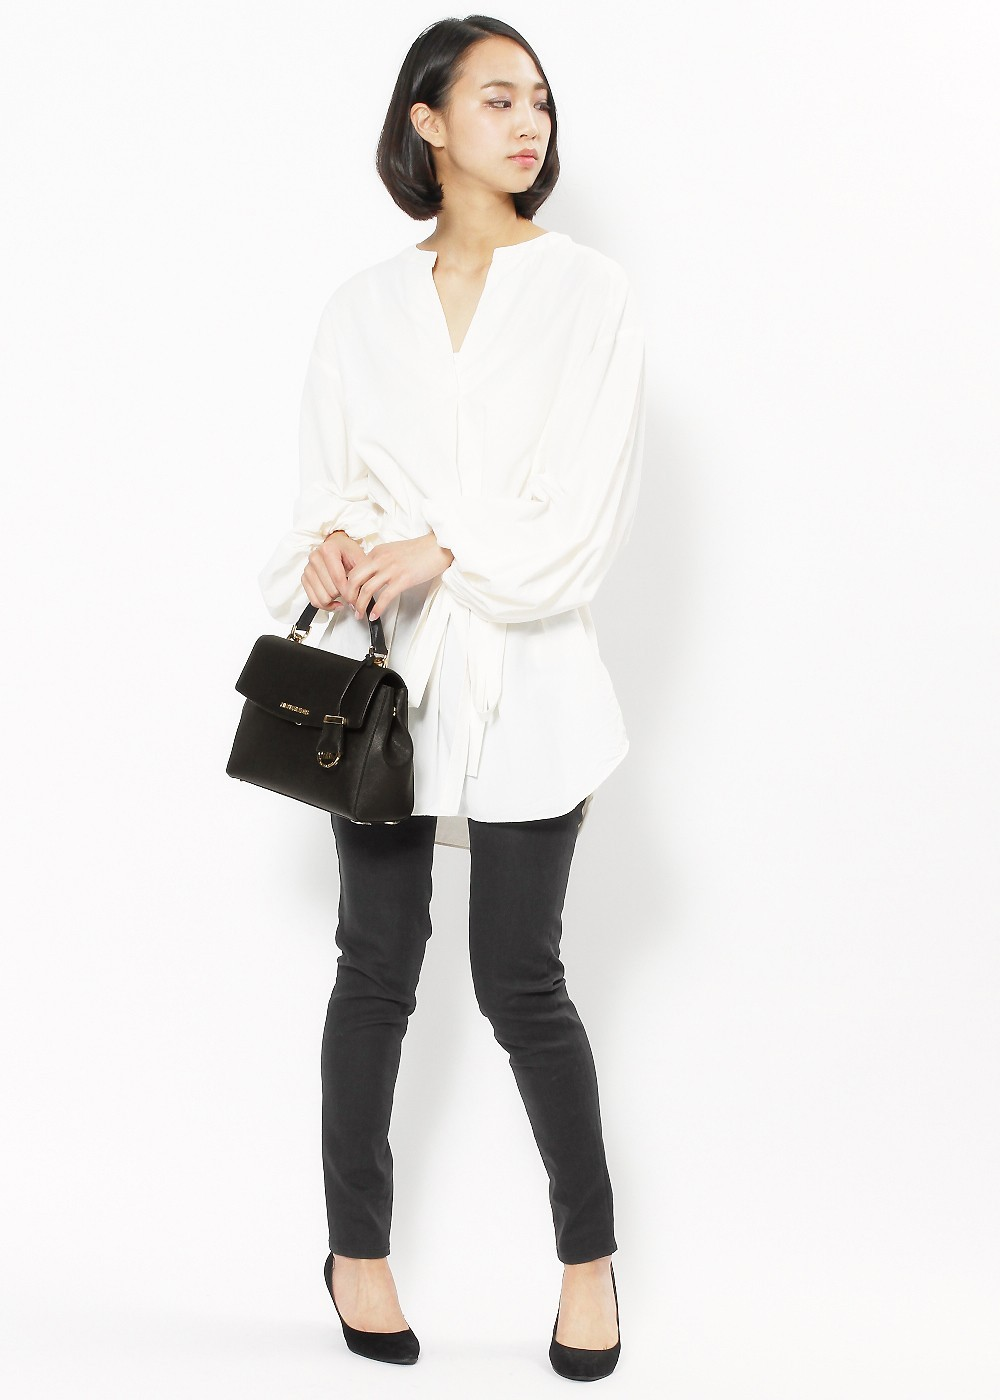 1663c8306ac9 【MICHAEL KORS】Ava BLACK ハンドバッグ オンラインファミリーセール - ブランドバッグ ...